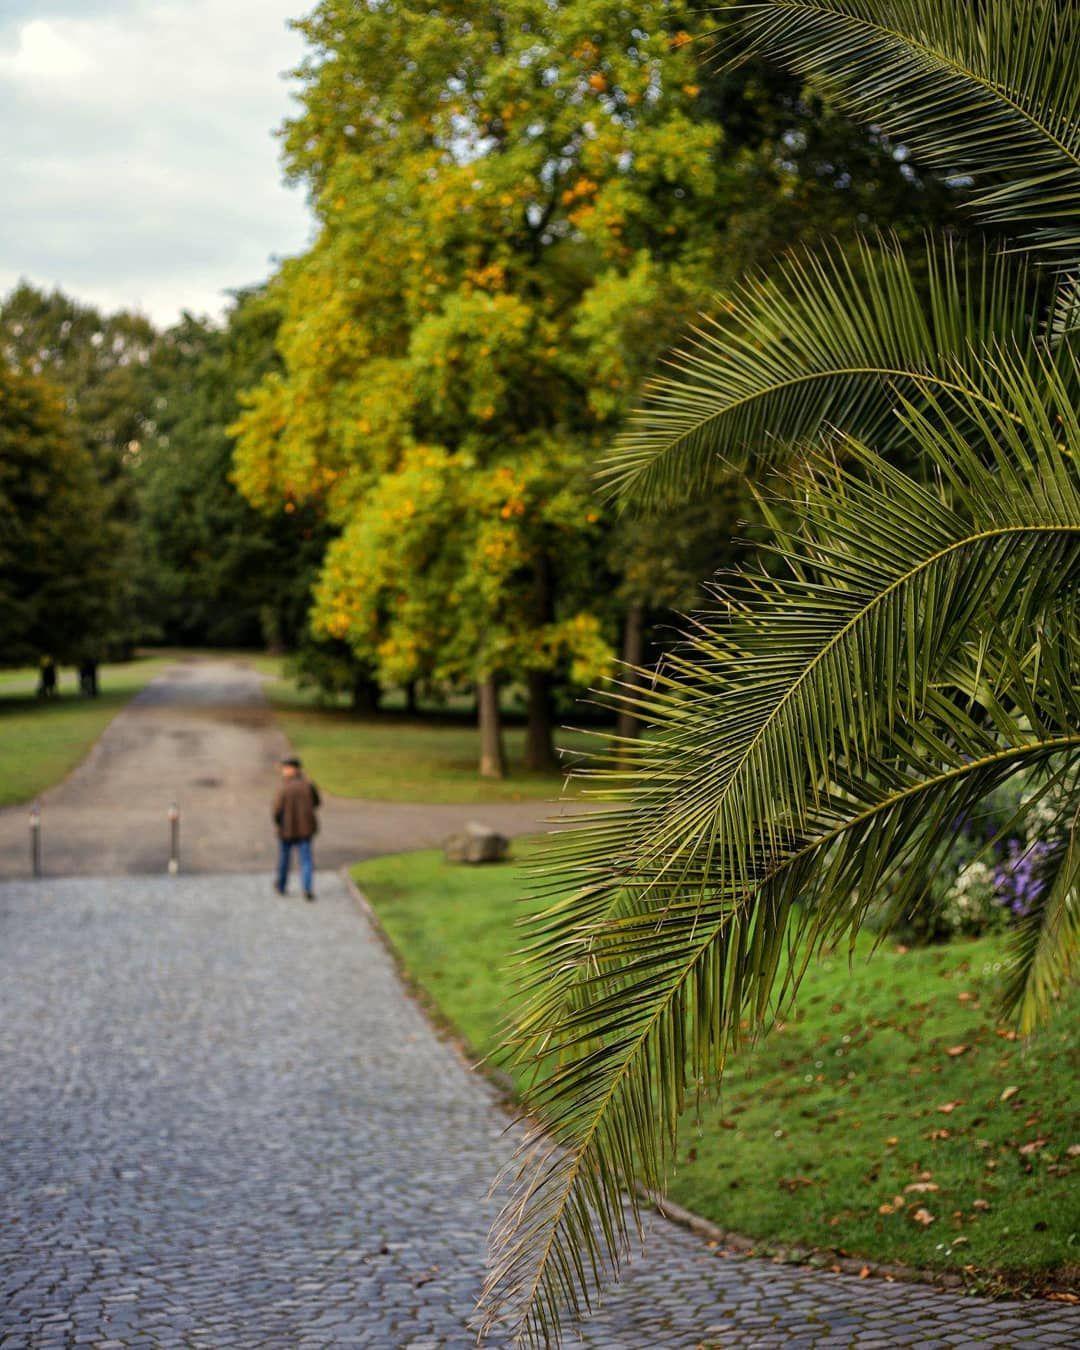 Autumn lights. Kassel, Karlsaue.  Photographer: @salogwyn_fine_Art  #nature #naturelovers #casselfornia #kassel #kasselfornia #wonderful_places #wonderfullife #beautifulnature #beautifullight #motherearth #worldbestshot #seascape #photography #divine_worldplaces #challenge #photooftheday #photoshoot #colorful #gurushotschallenge #gurushots #shotaward #ig_mood #autumn #autumnvibes🍁 #amazing_shots #tree_pictures #tree_magic #tree_love